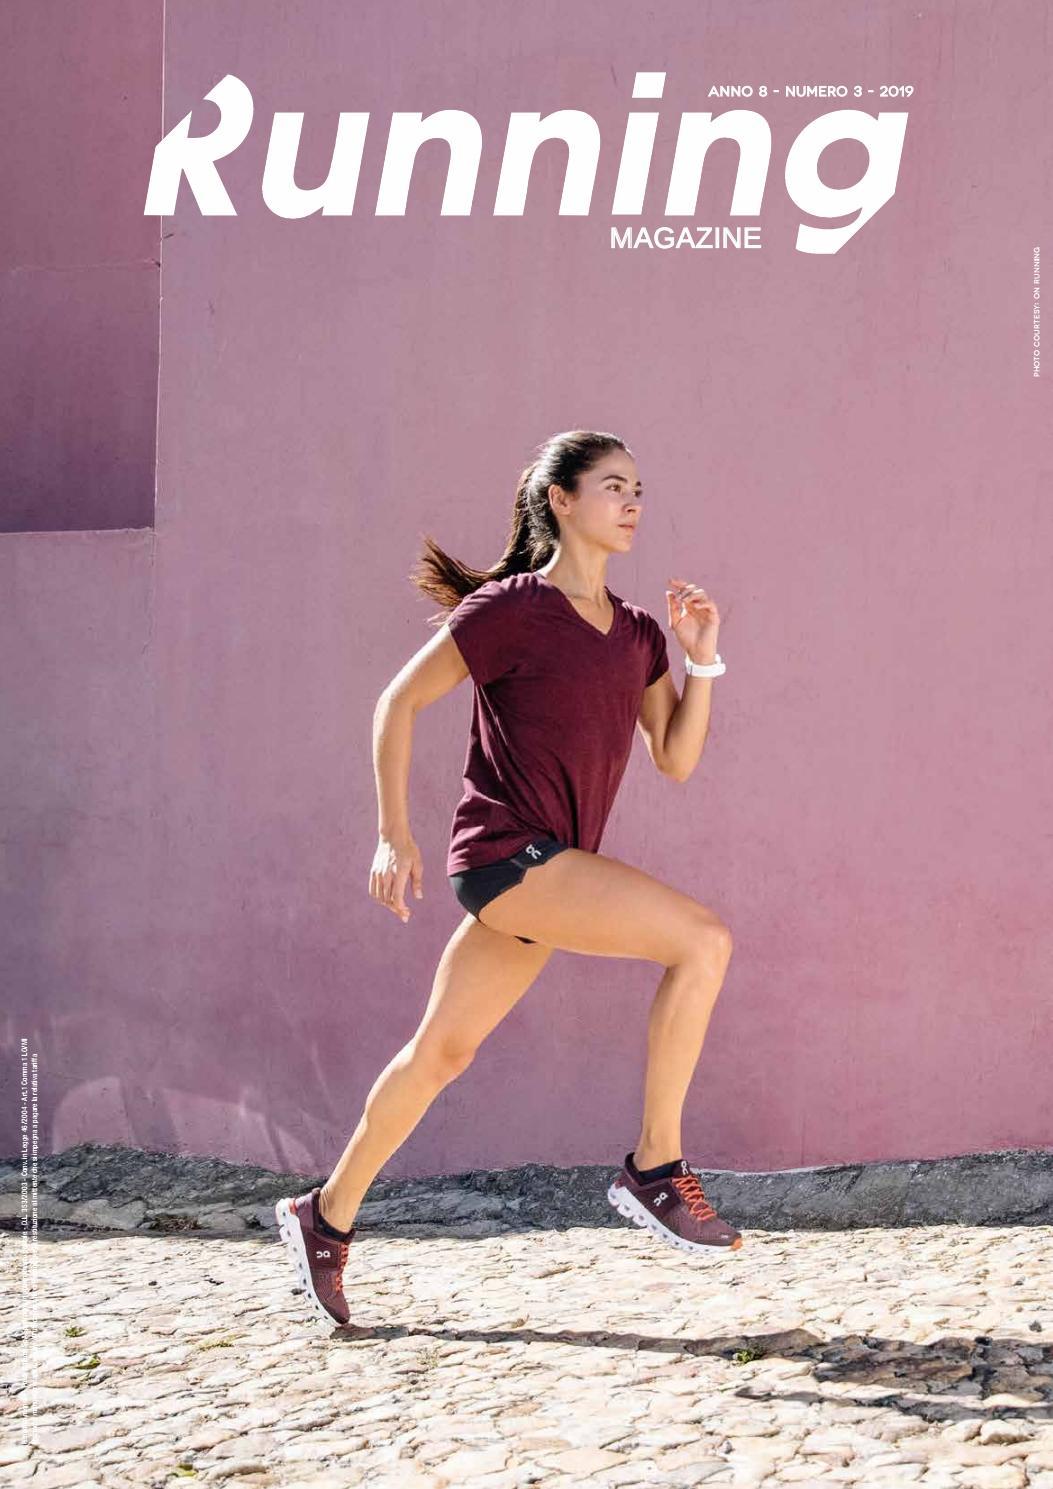 0a807dec4d04 Running Magazine 3 - 2019 by Sport Press - issuu